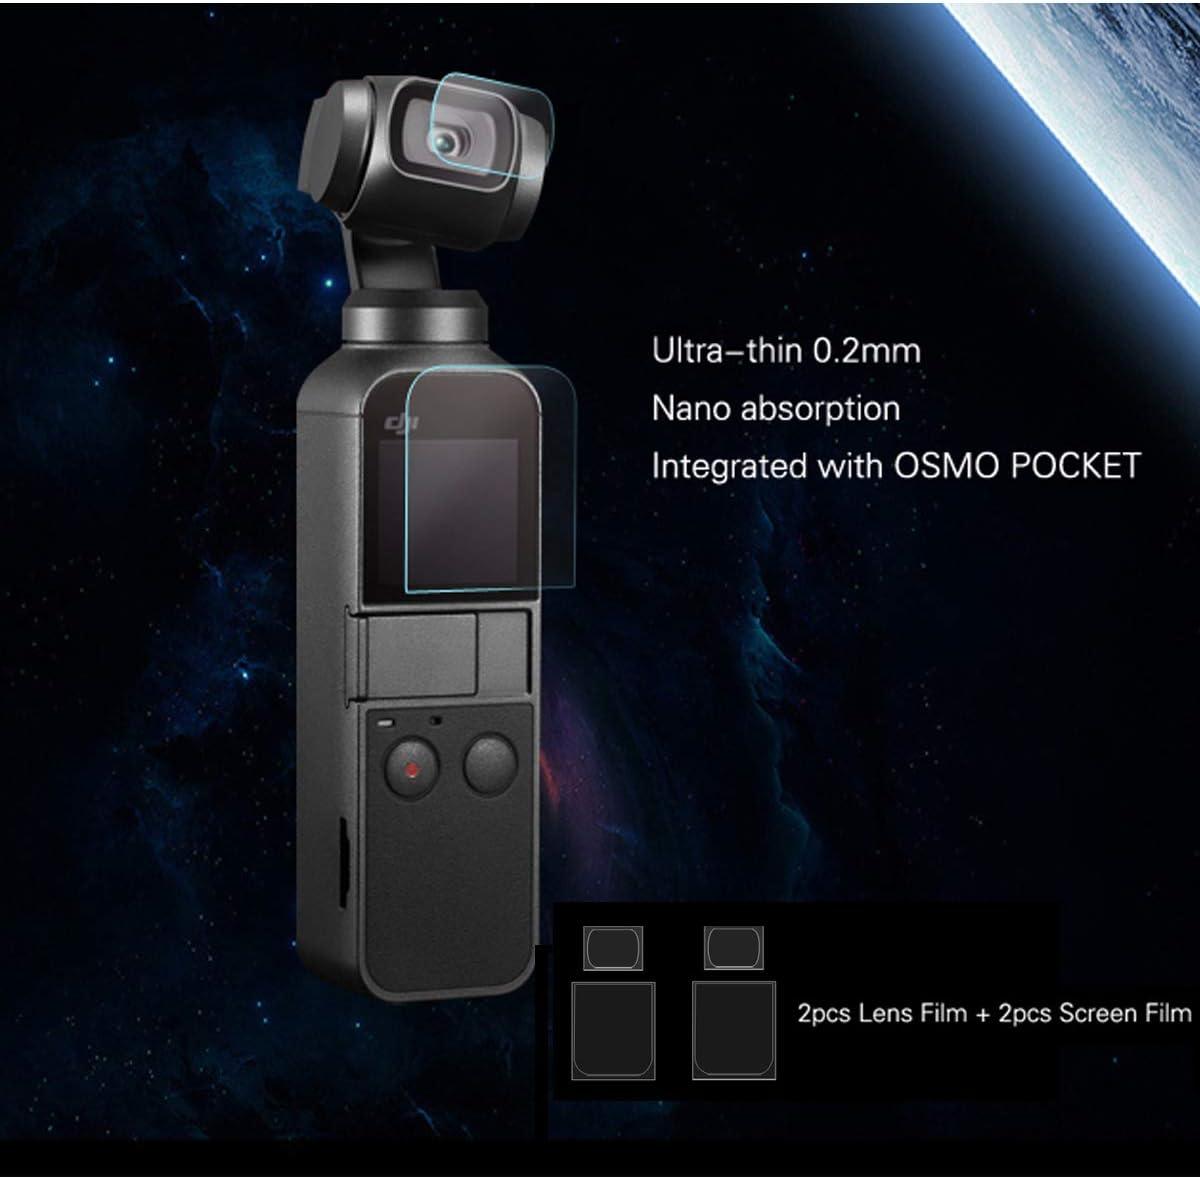 2PCS Screen Film Screen Protector Ultra-Thin Glass Screen Protector Foils for DJI Osmo Pocket Handheld Gimbal Camera Accessory Tineer 2PCS Lens Film